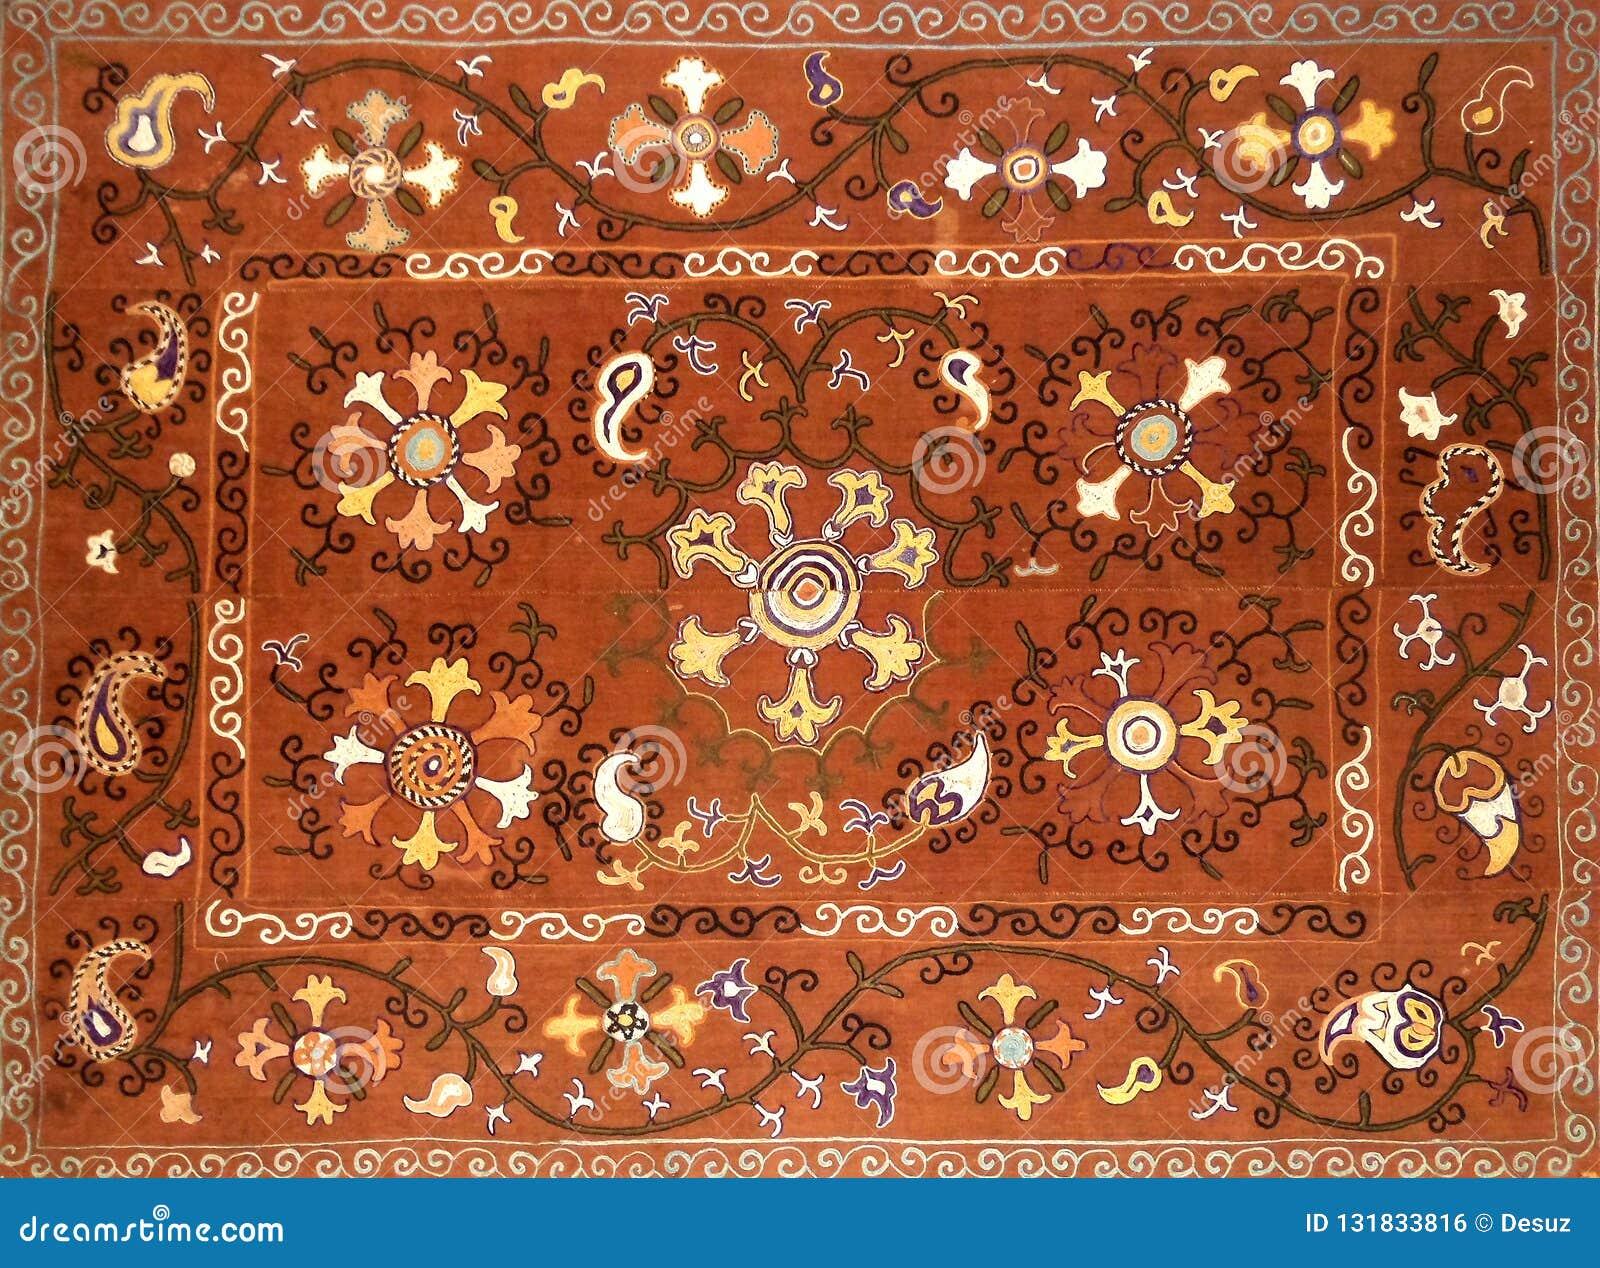 Eastern arabic decorative embroidery pattern